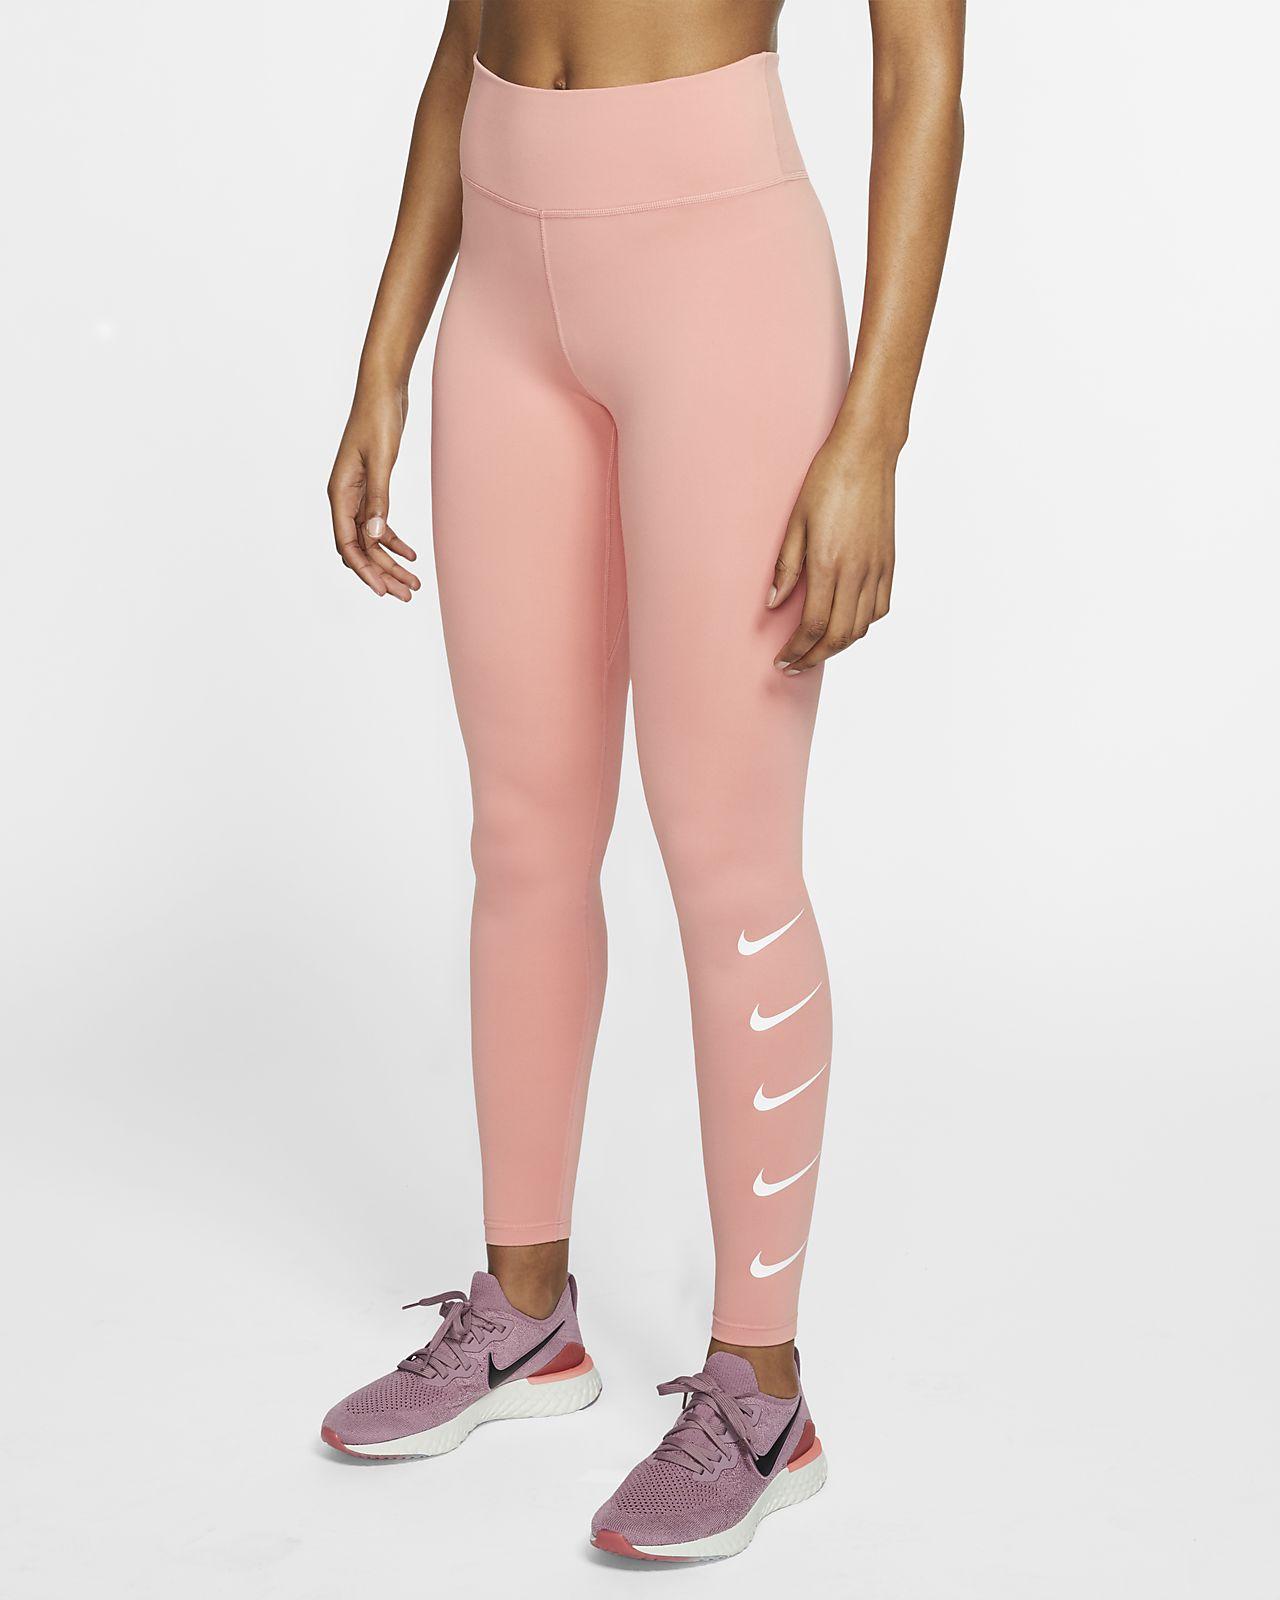 Nike Swoosh Women's Running Tights